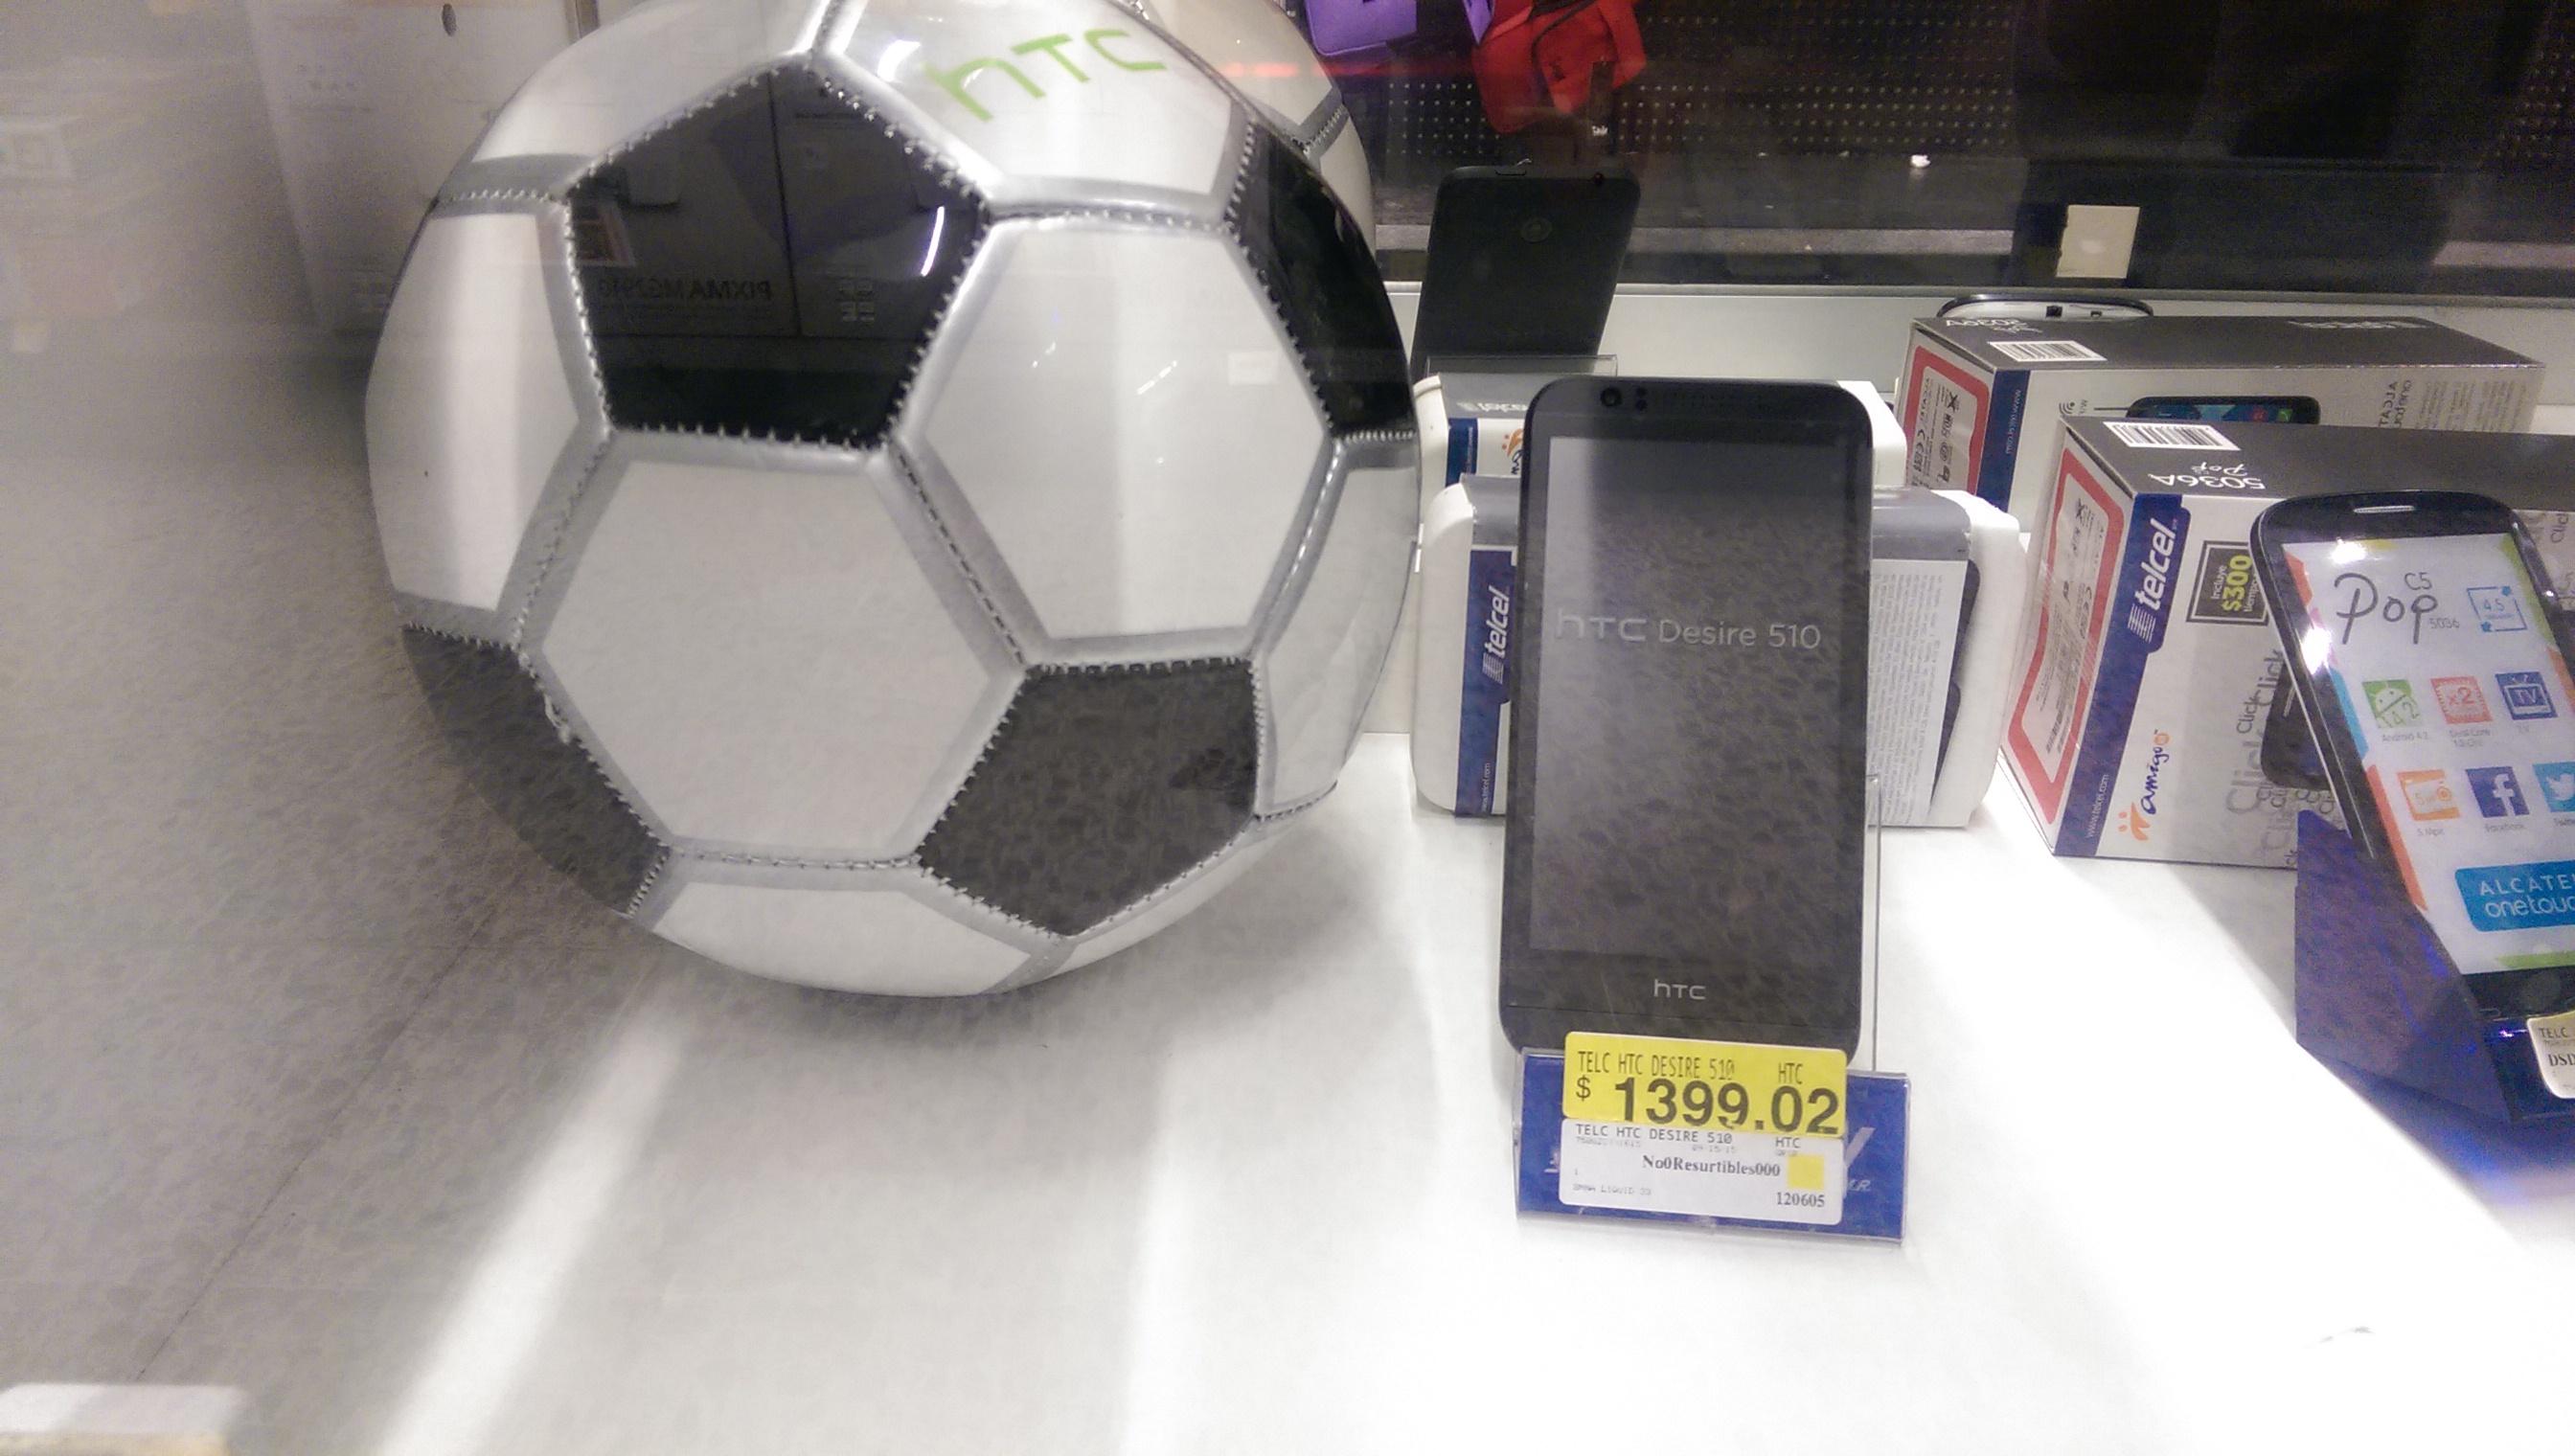 Bodega Aurrerá: HTC DESIRE 510 EN REMATE de $4,299 a $1,399.02